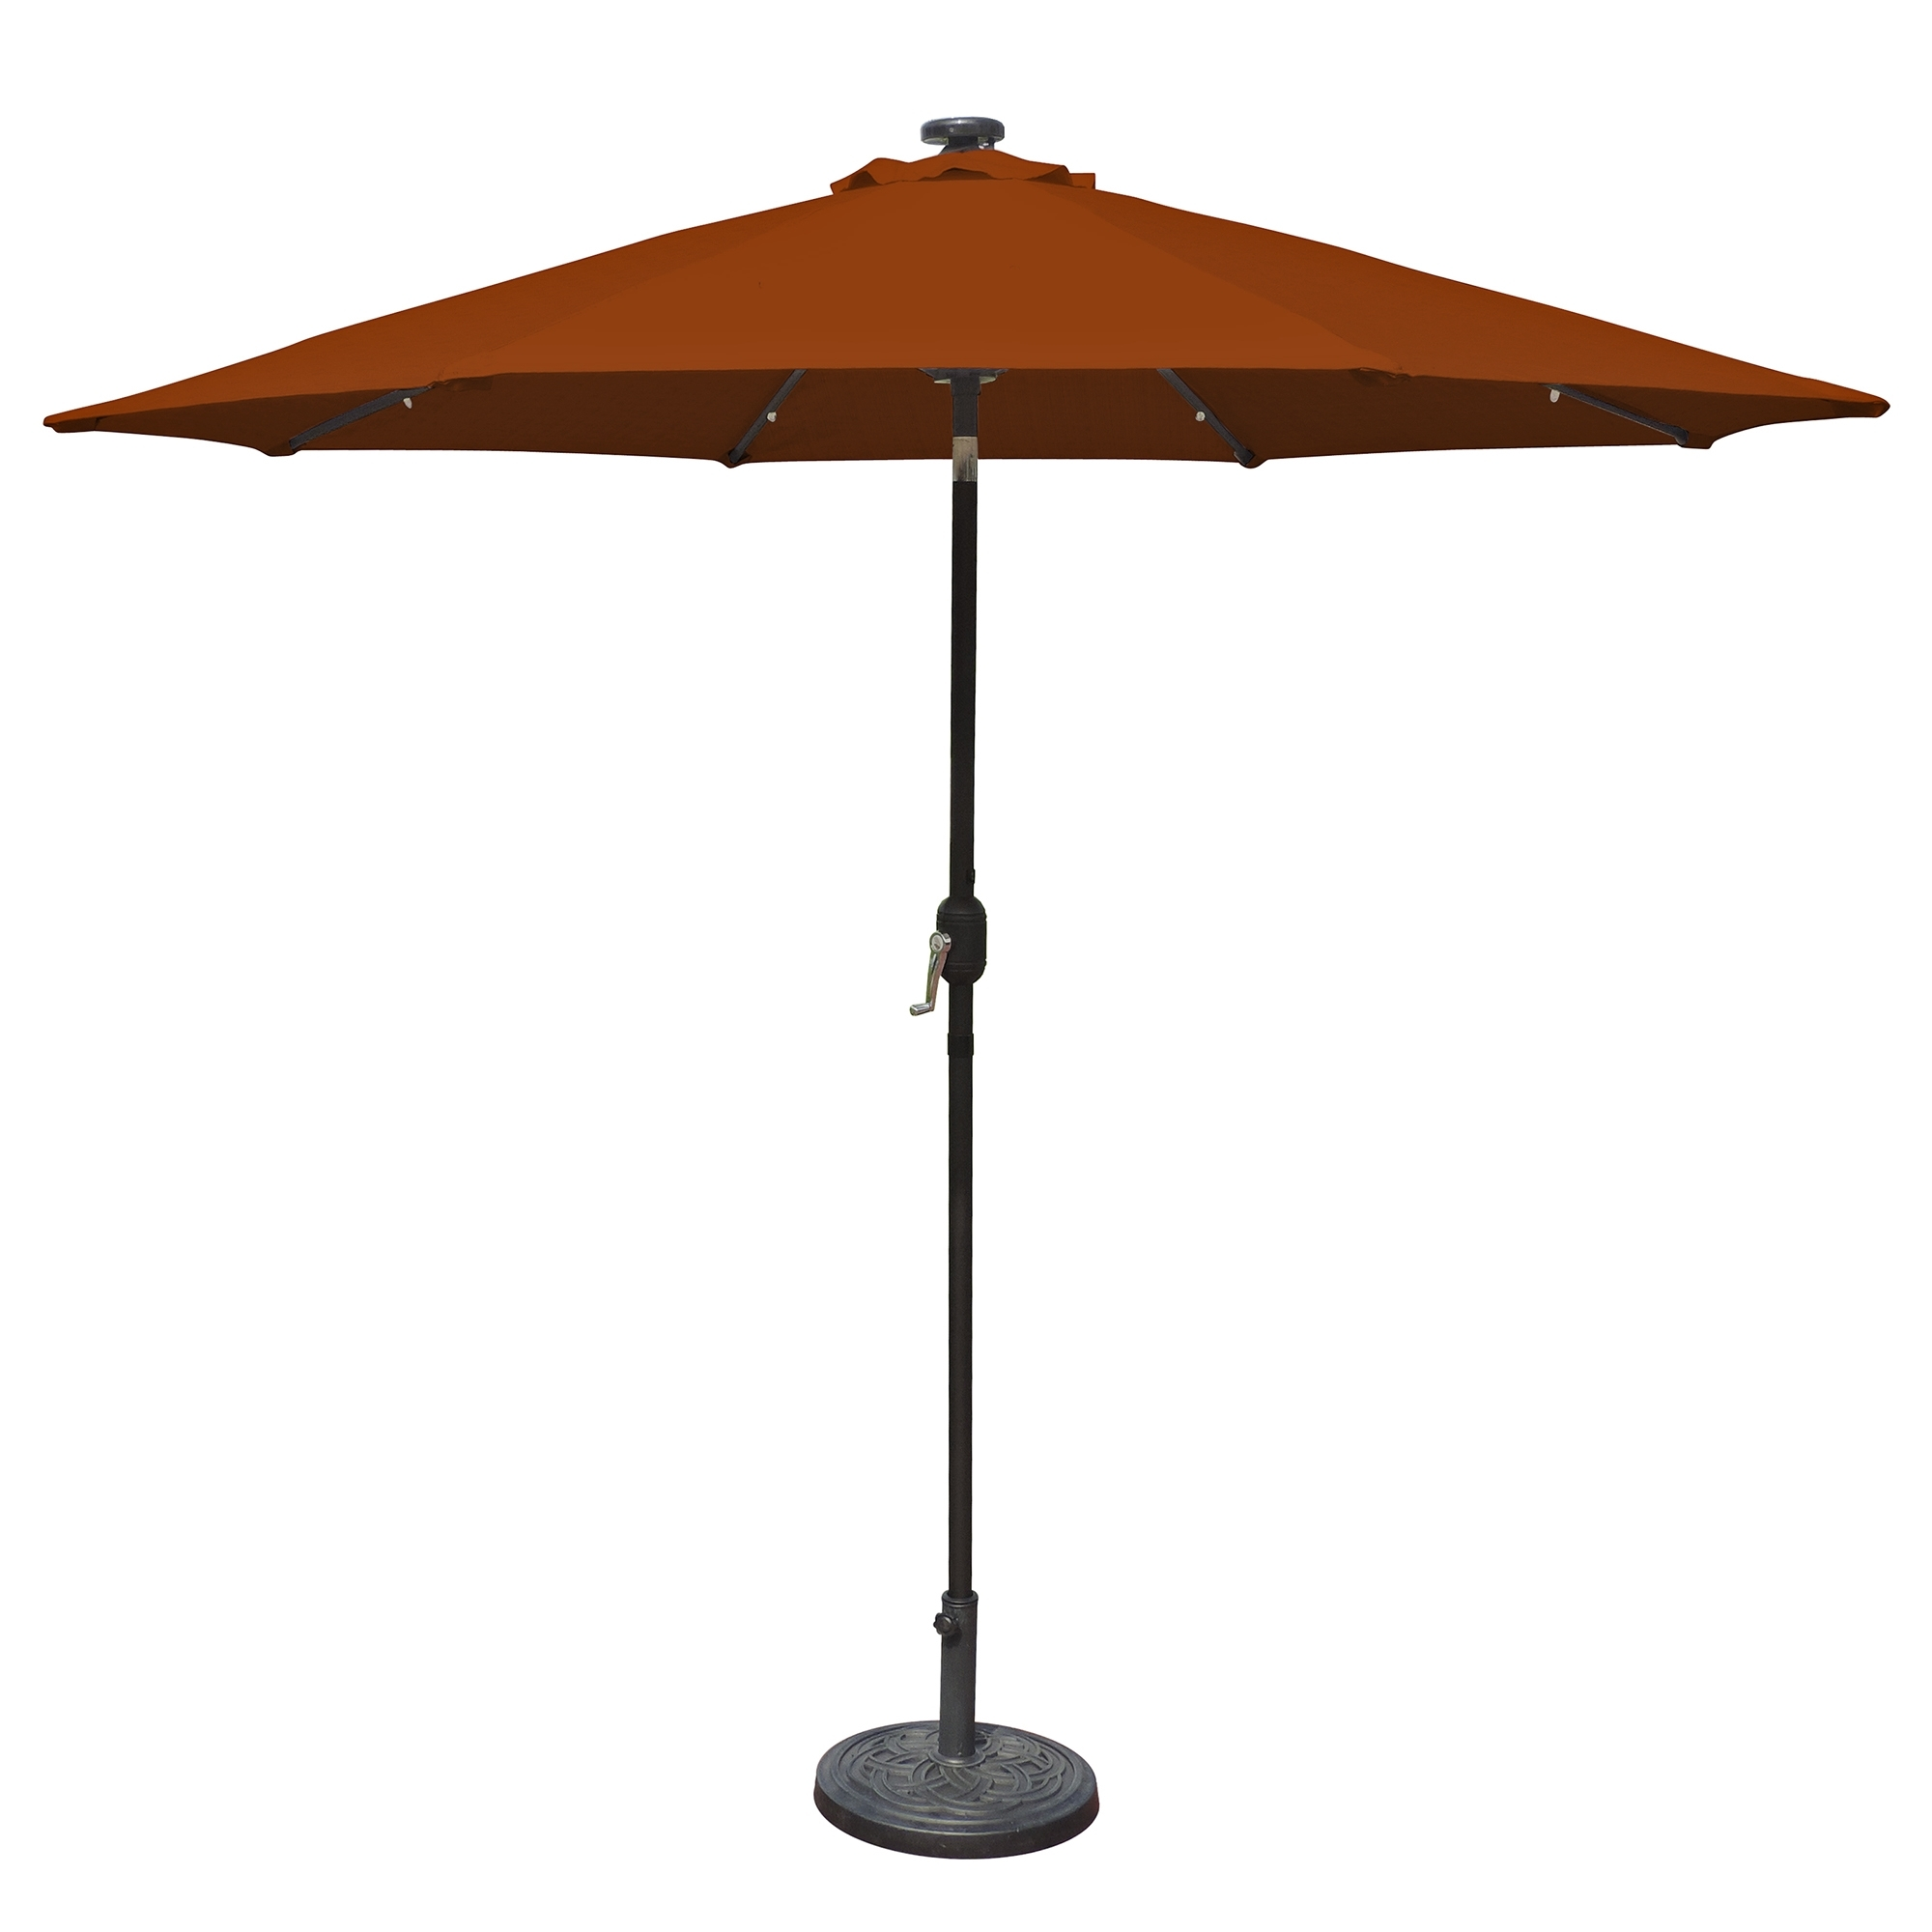 Led Patio Umbrellas Pertaining To Popular Island Umbrella Mirage Fiesta 9 Ft Market Solar Led Auto Tilt Patio (View 7 of 20)